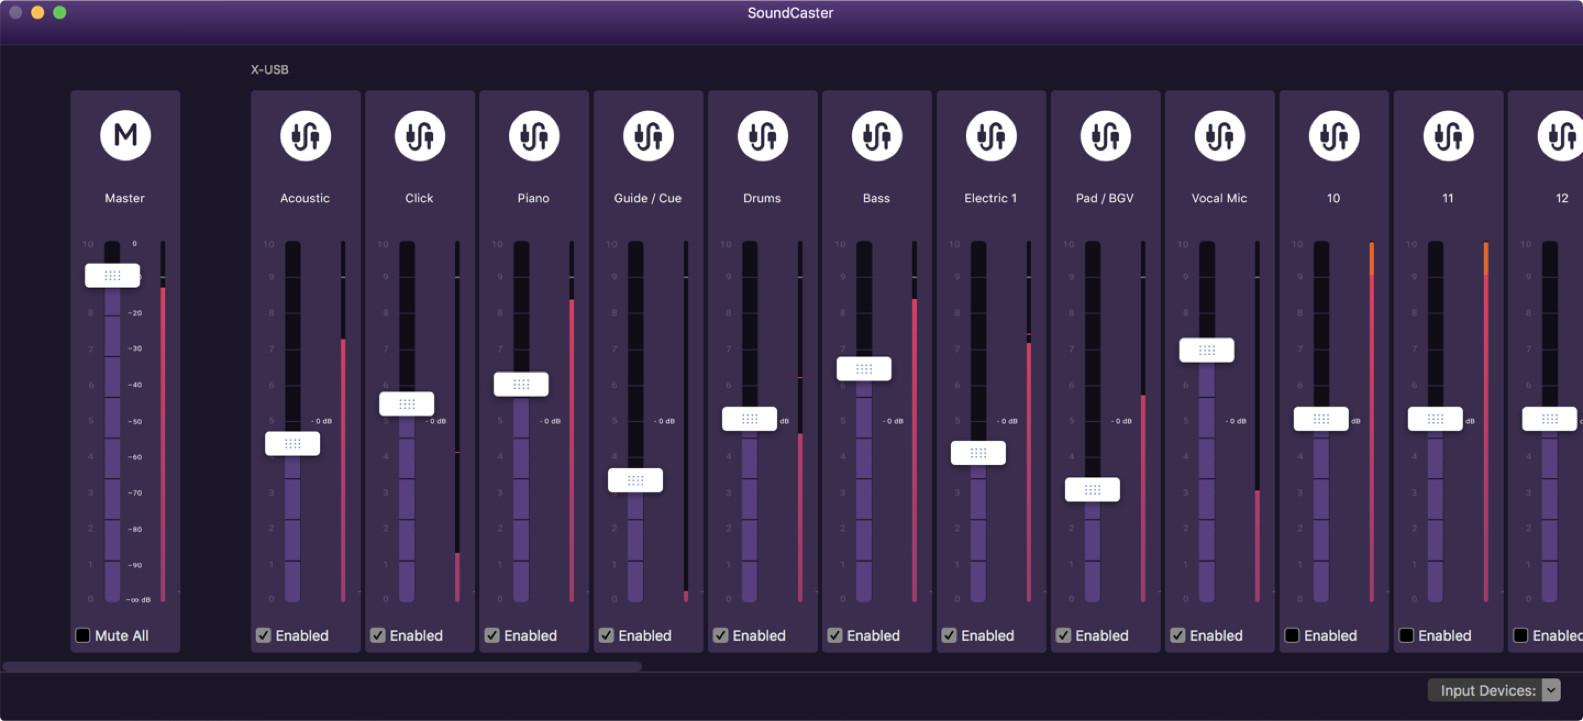 Audiofusion Soundcaster GUI